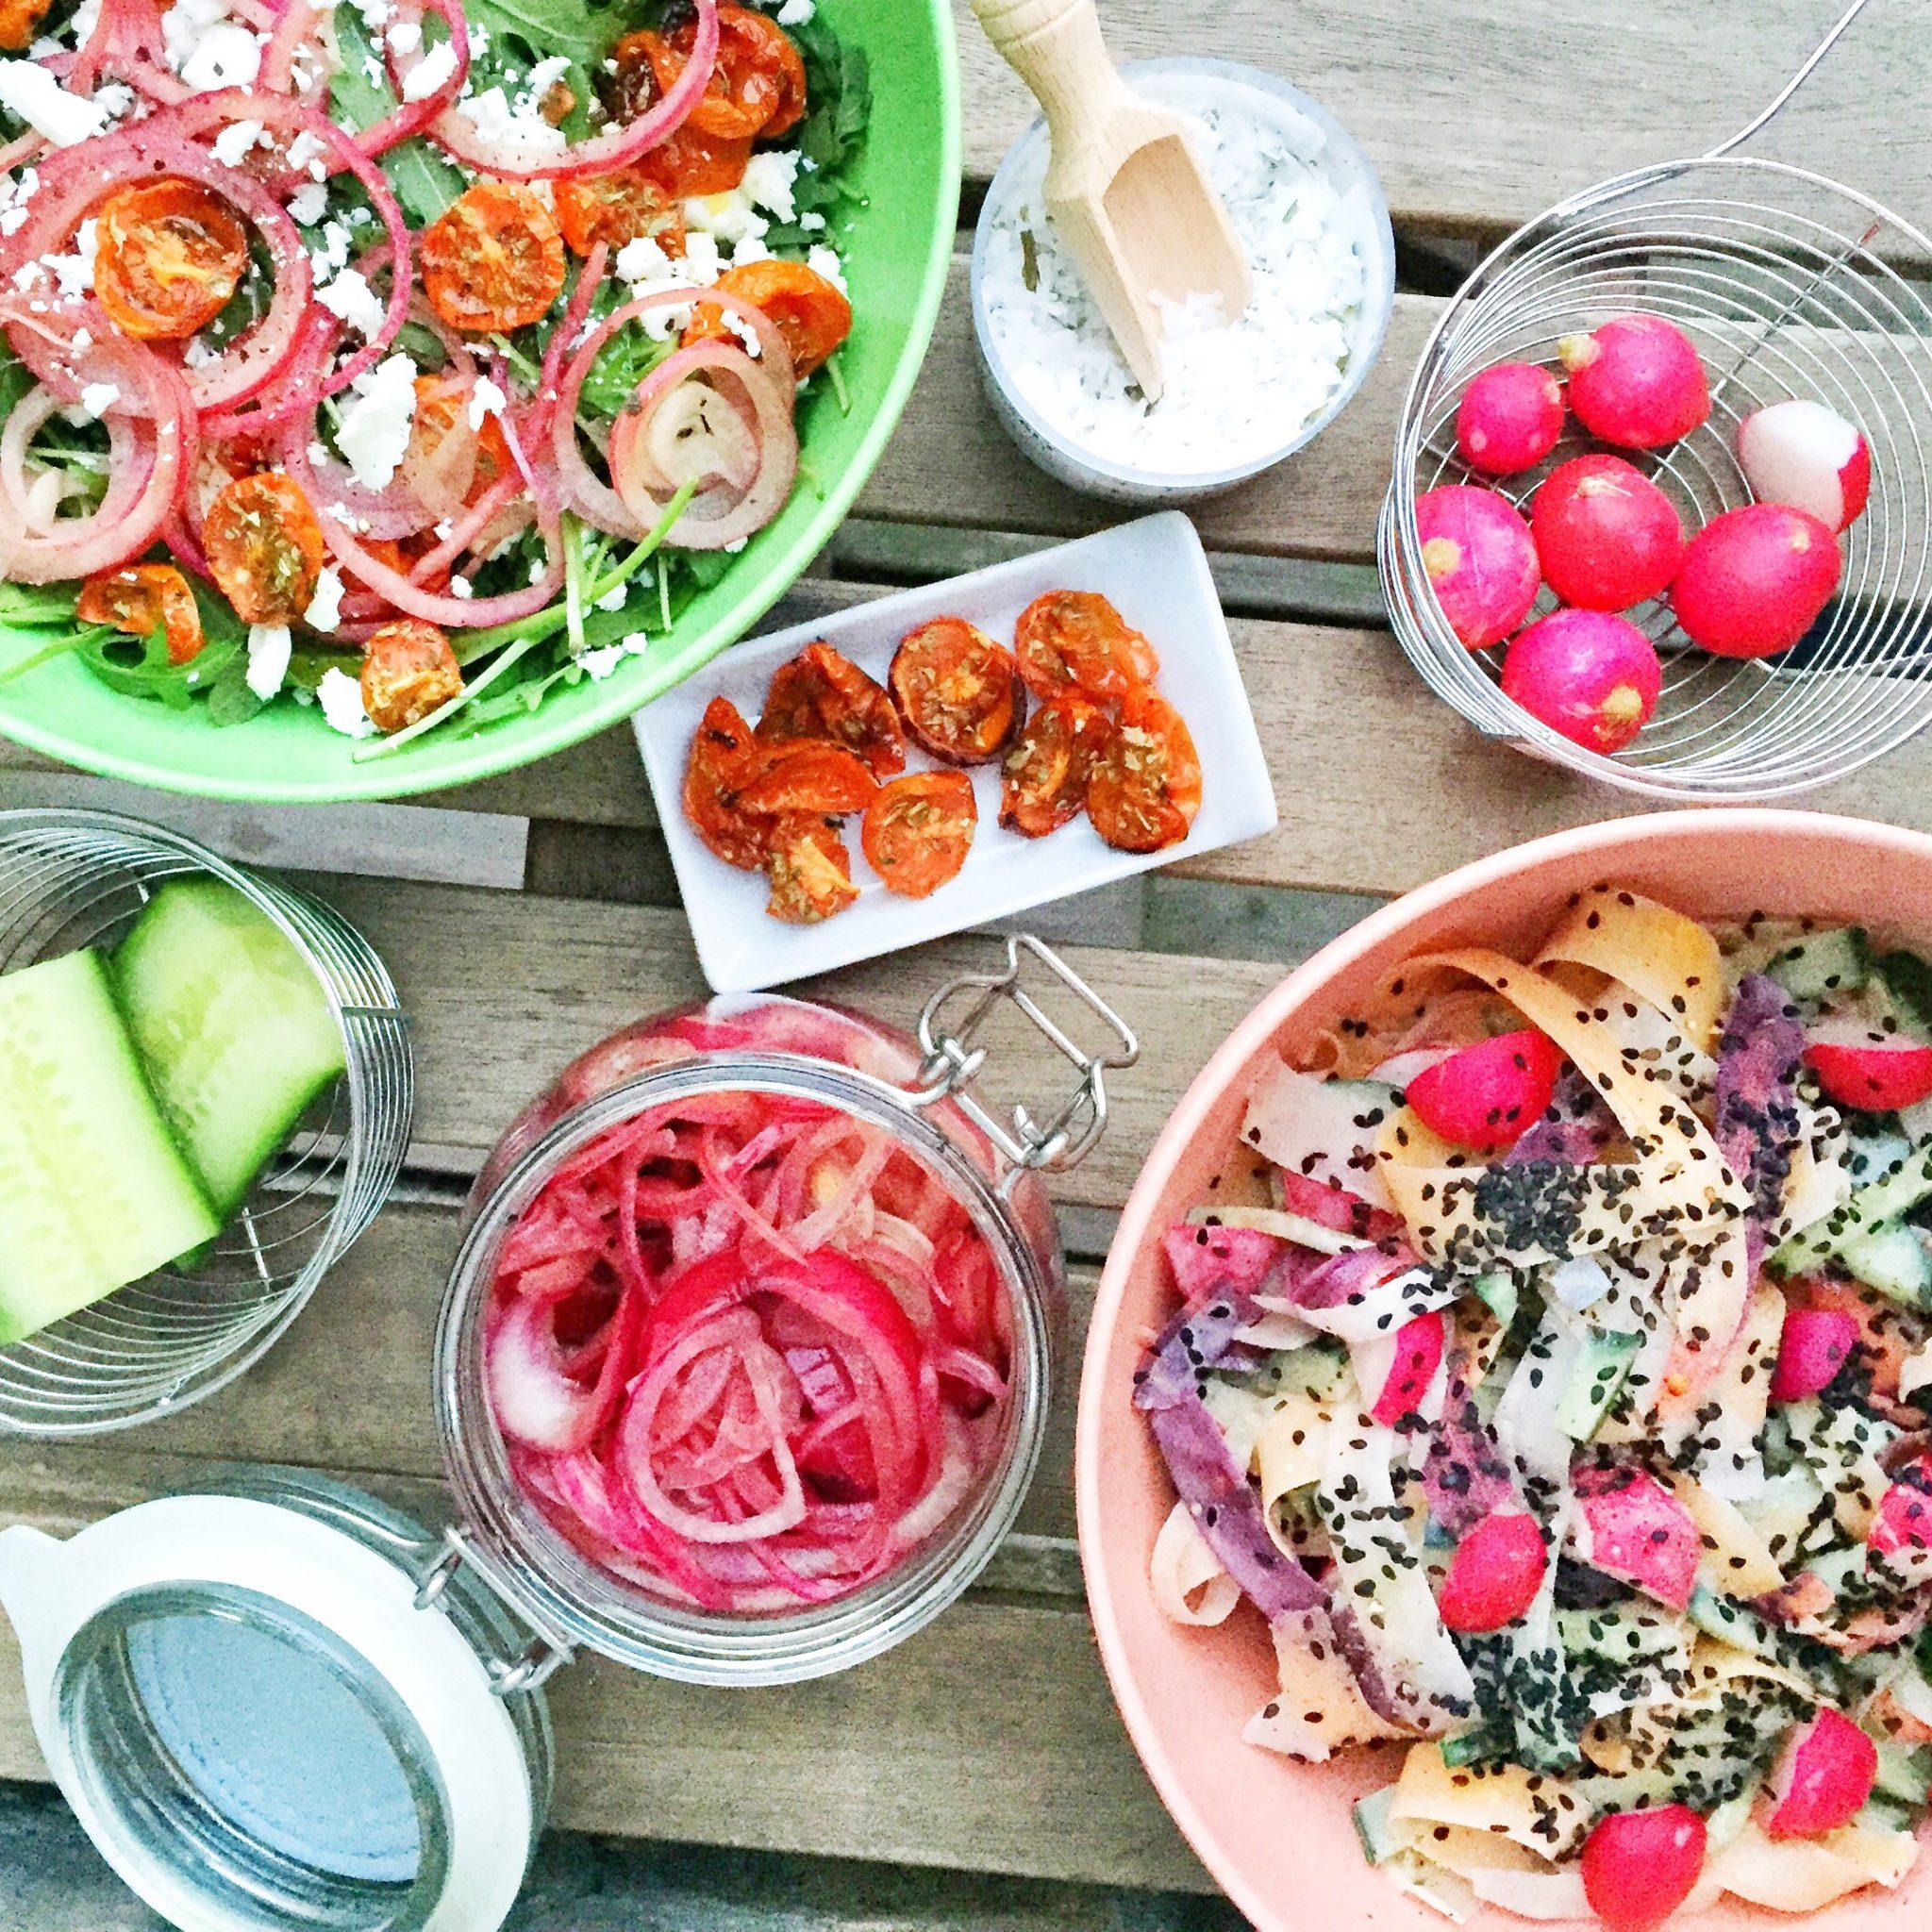 Salat med radiser, tomat, ost og andet grønt. Forårssalat